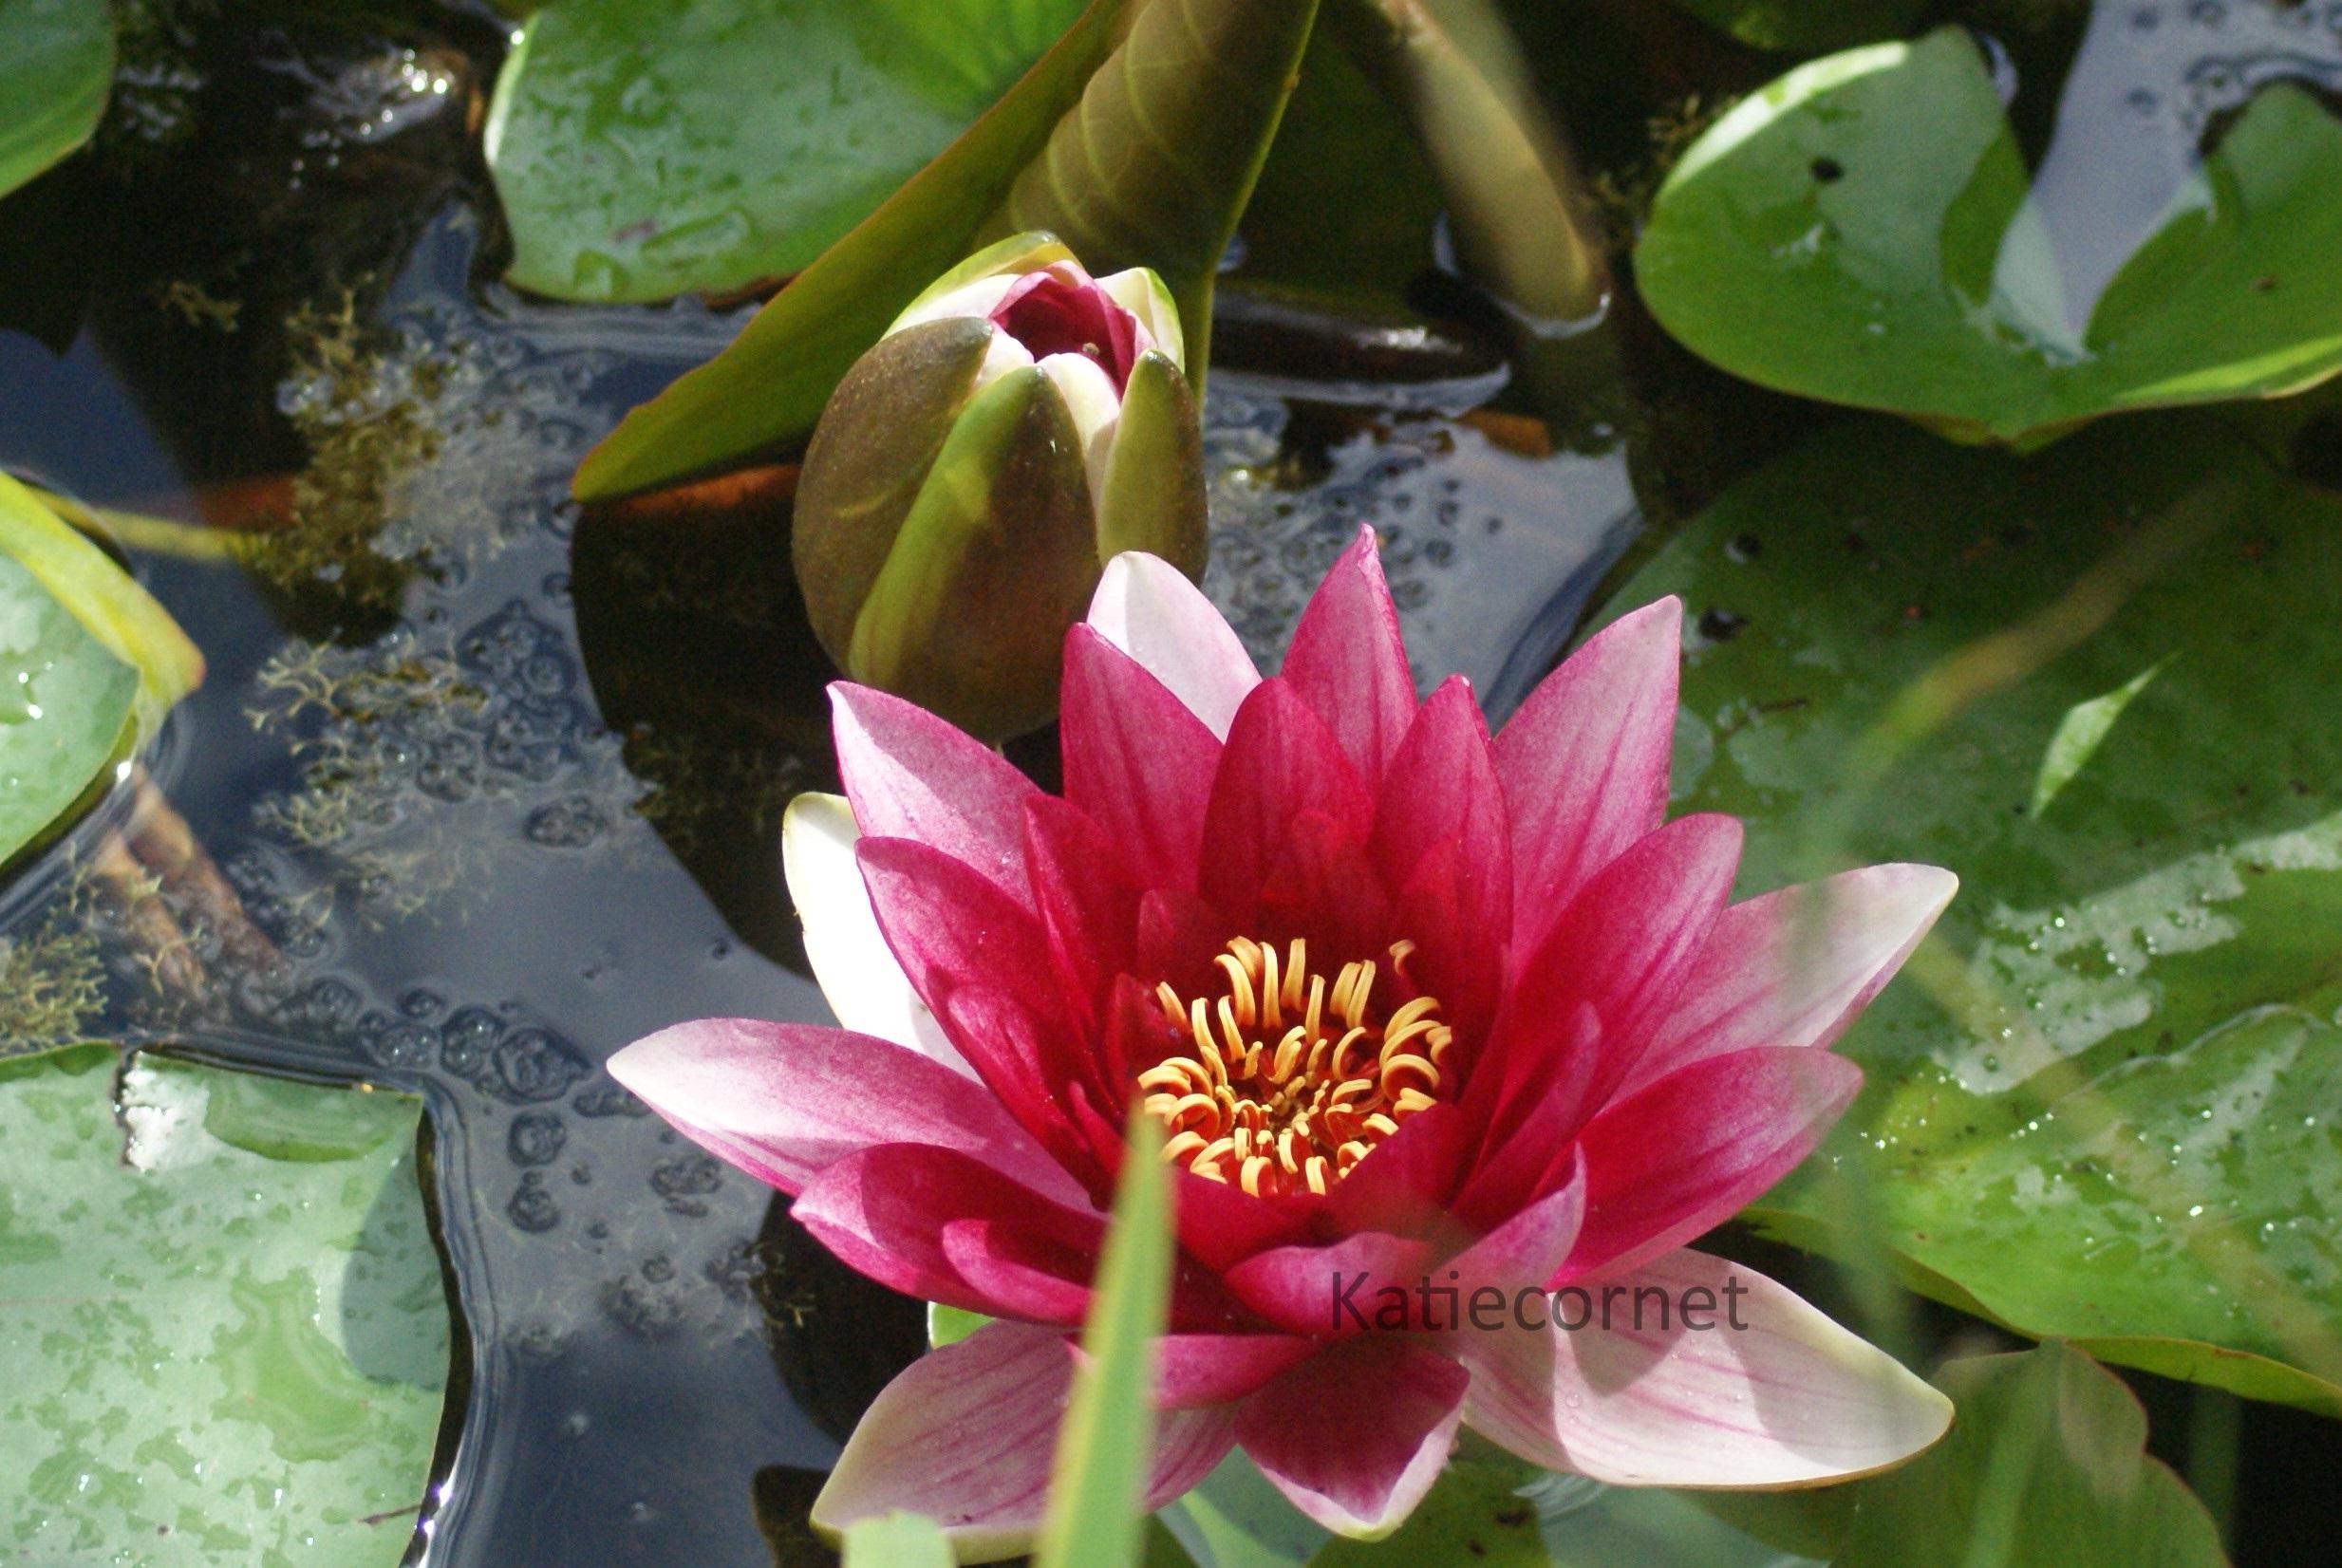 2,4 Stunning single pink lily.